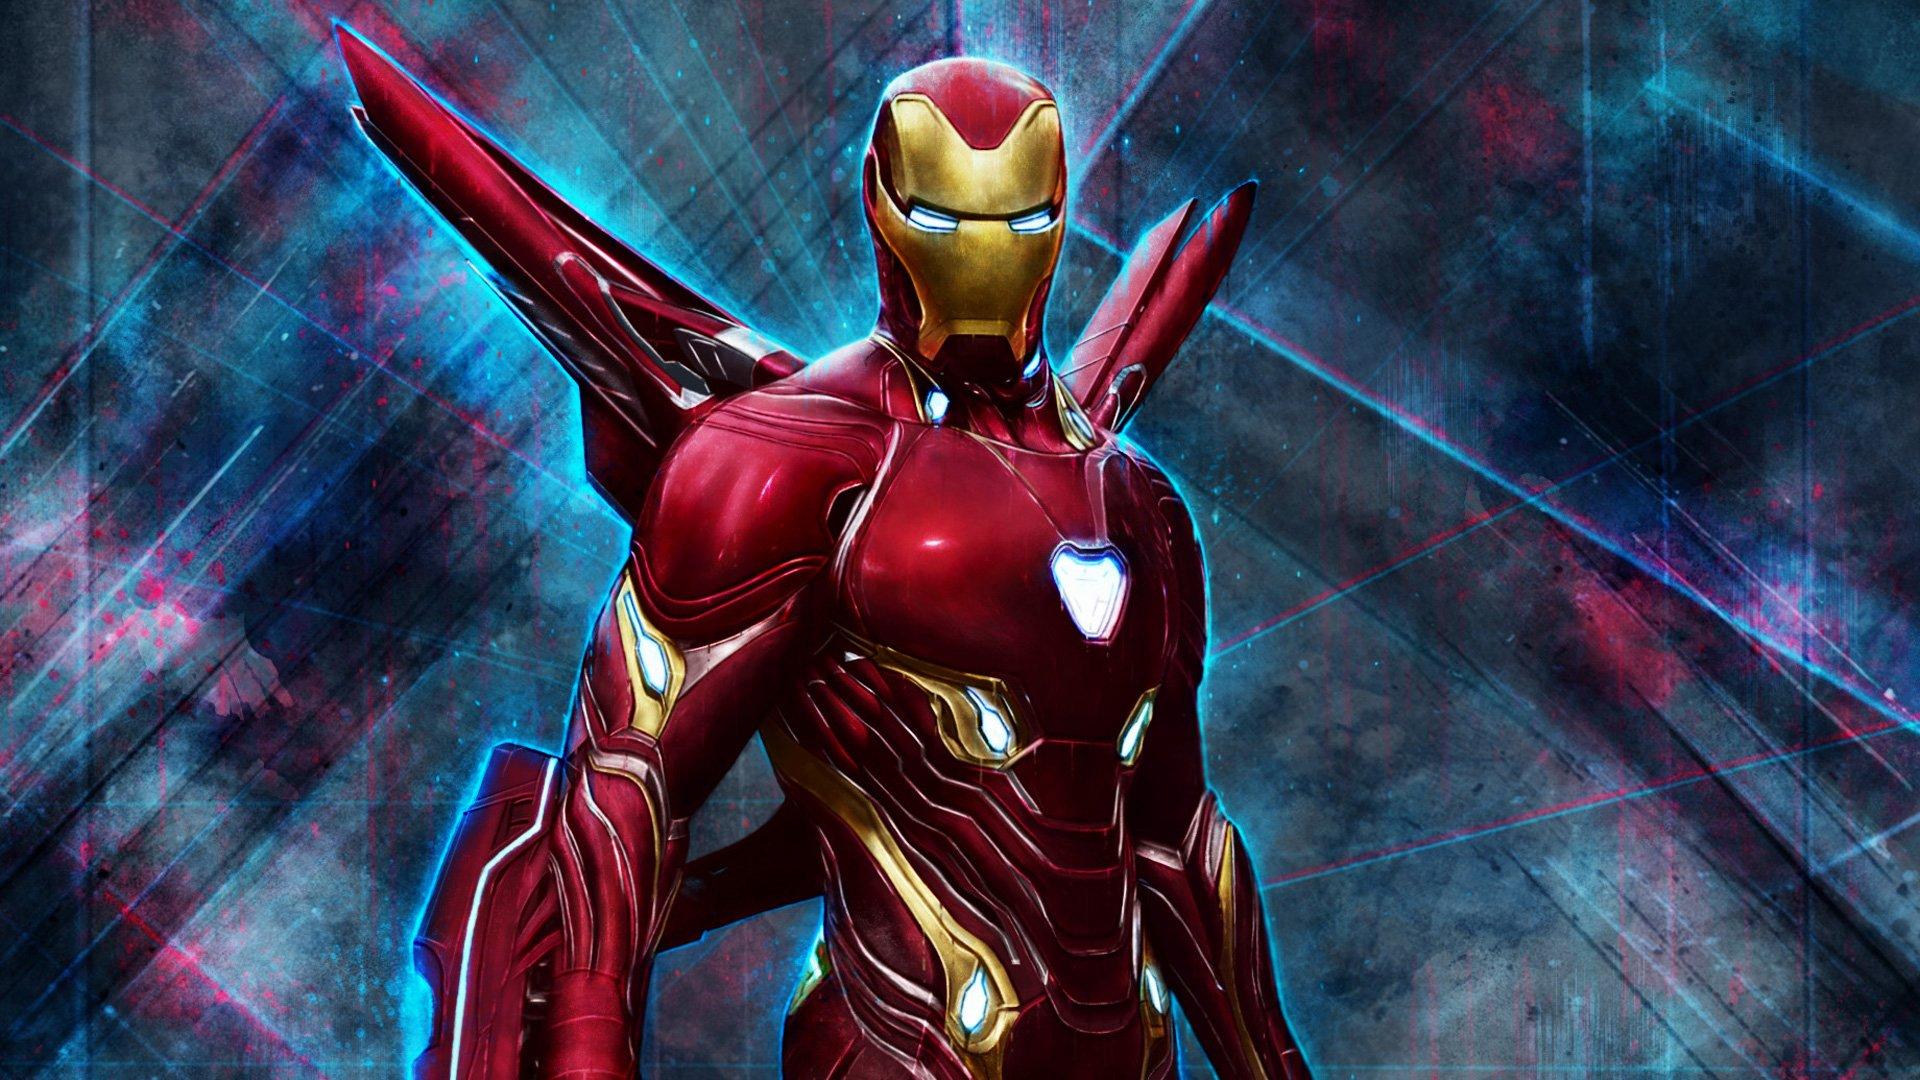 Iron Man Hd Wallpaper Hintergrund 1920x1080 Id971653